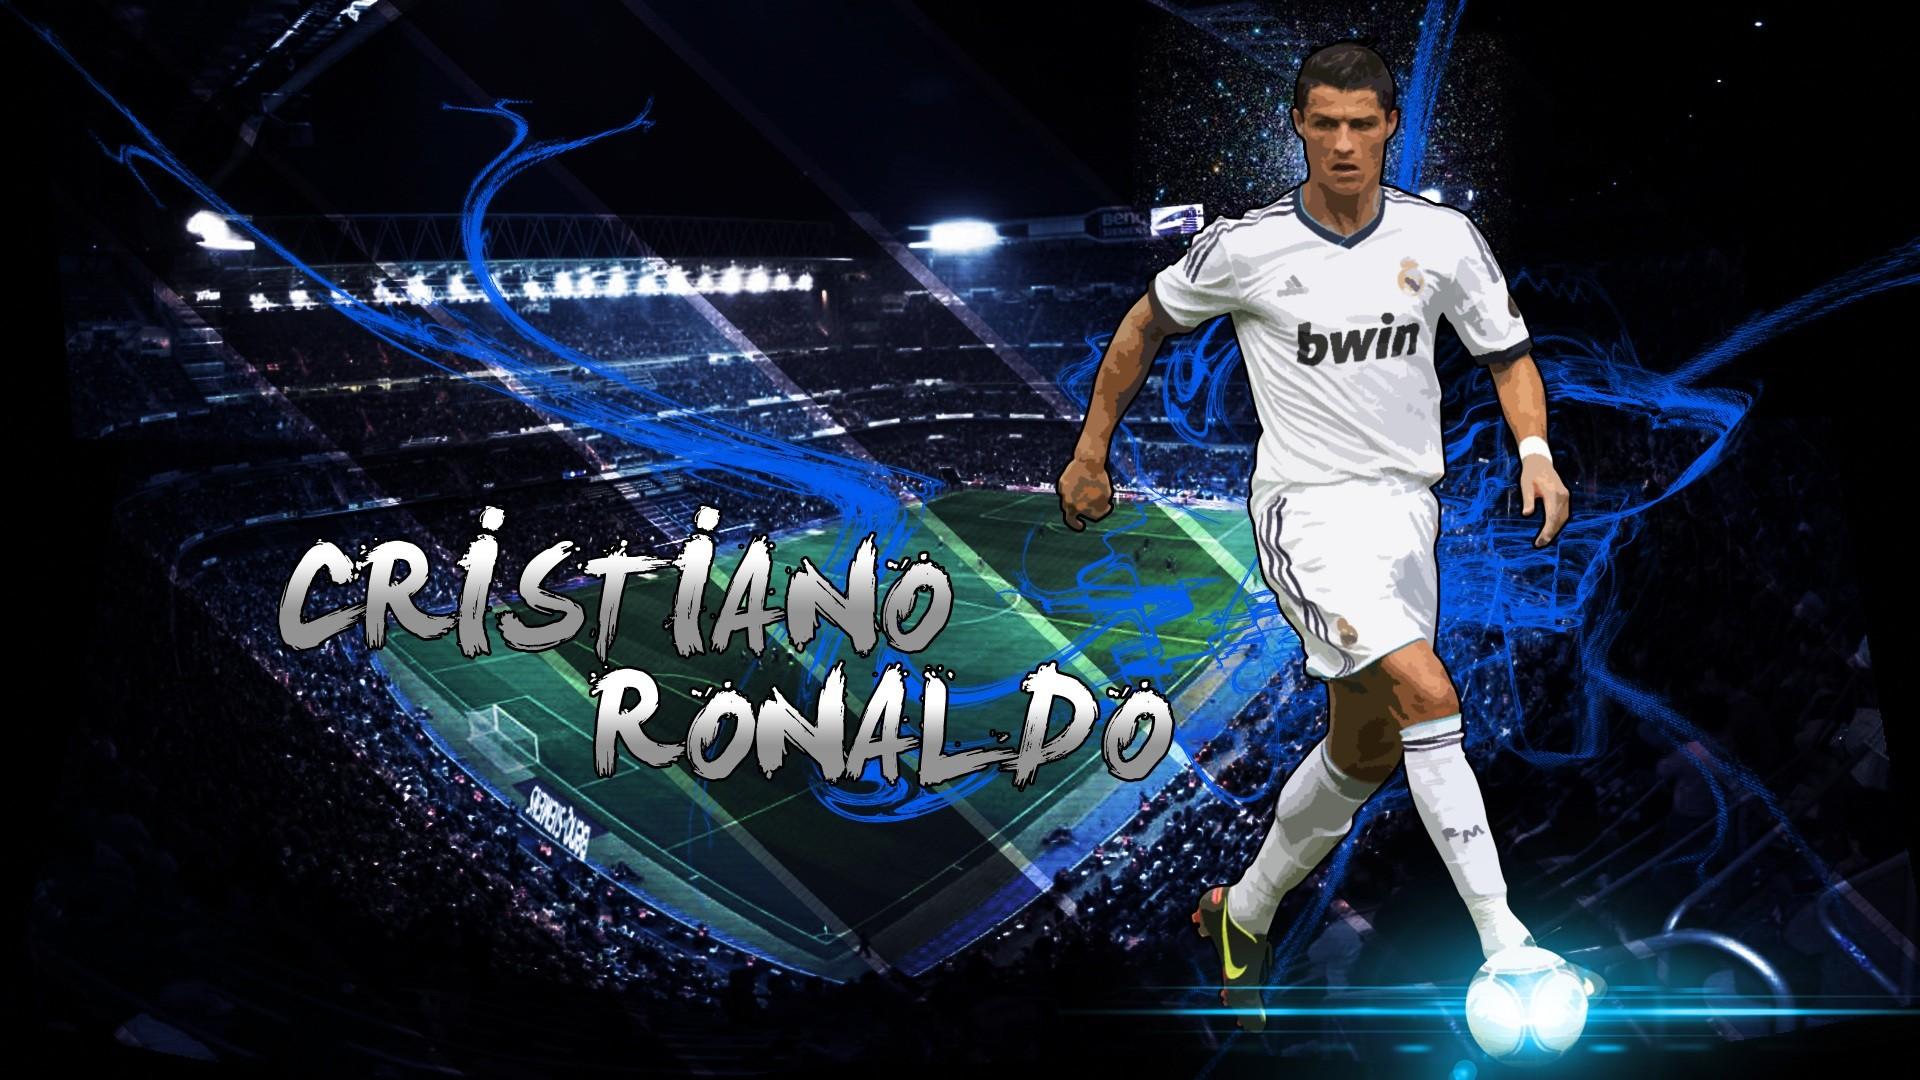 Christiano Ronaldo Spielt Fussball Zum Ausmalen Zum Ausmalen So